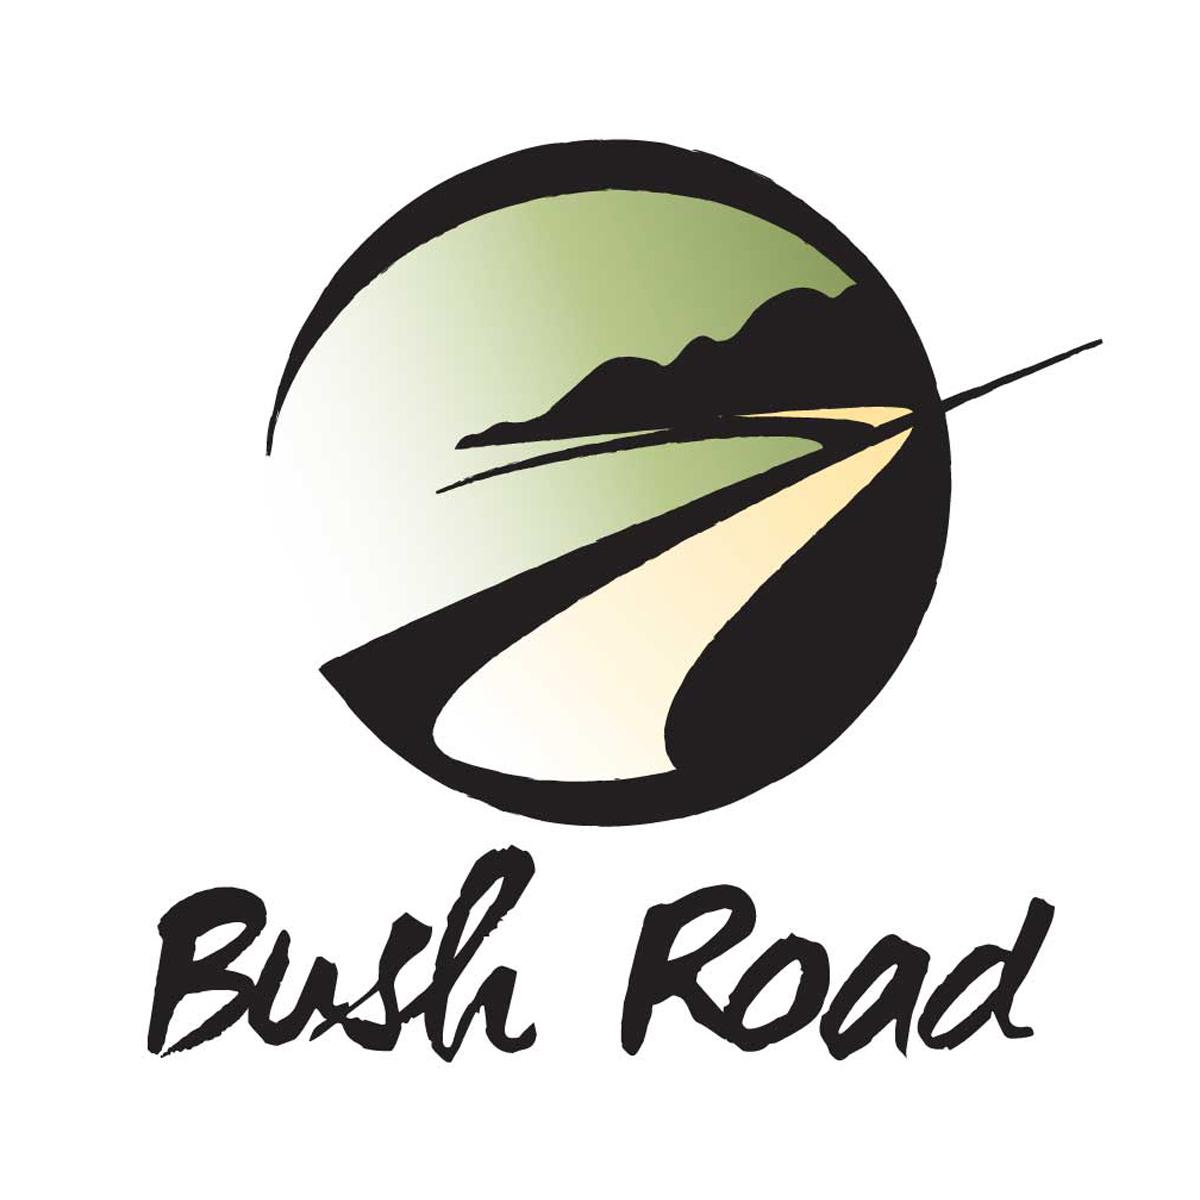 BushRoad-Logo-Square.jpg